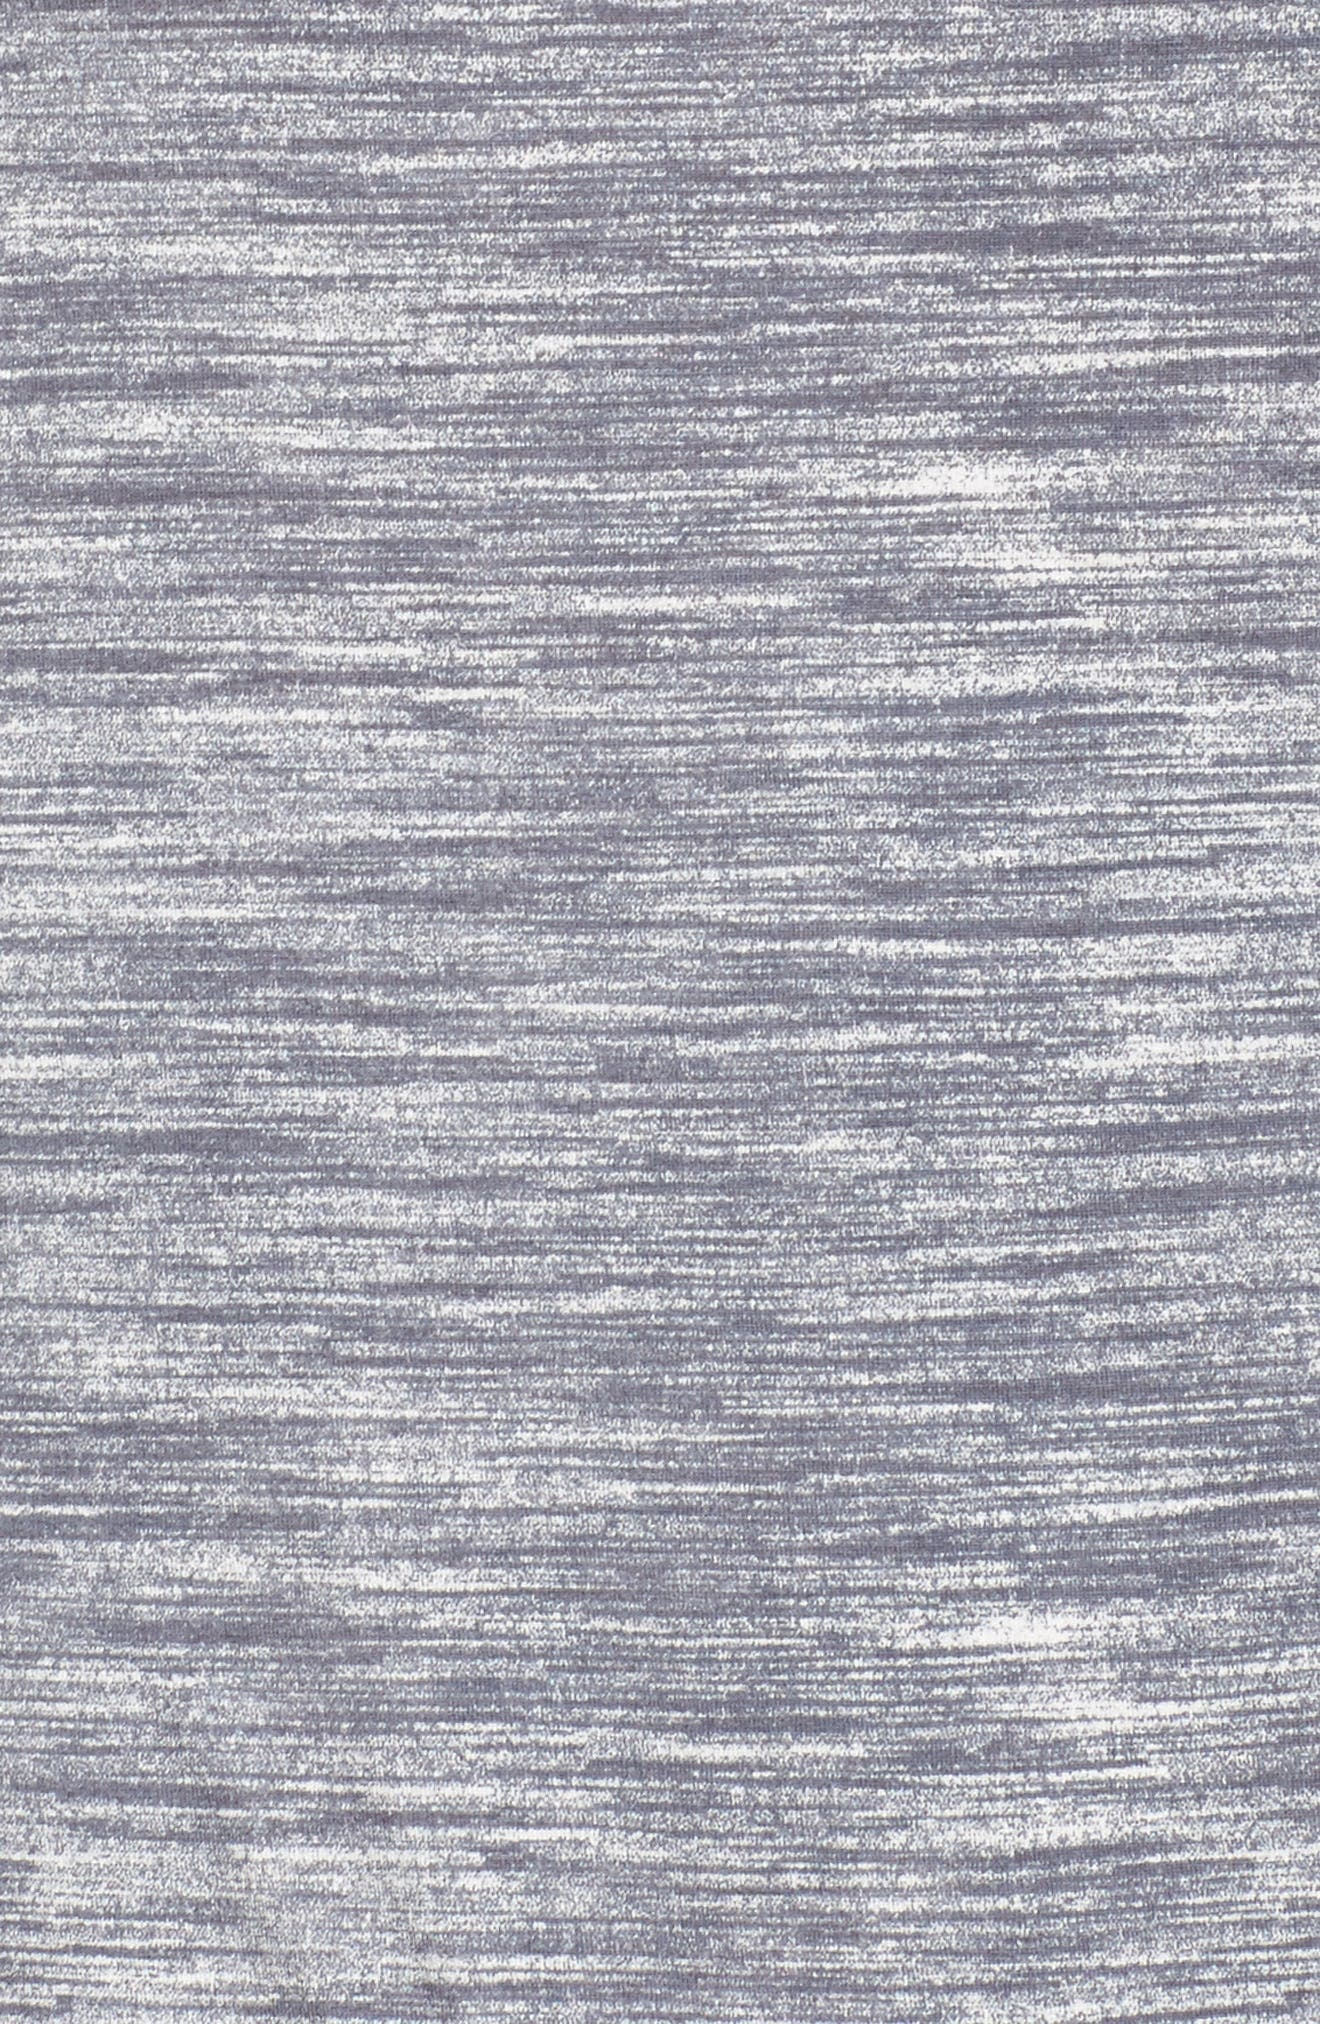 Dolman Sleeve Space Dye Tee,                             Alternate thumbnail 5, color,                             030